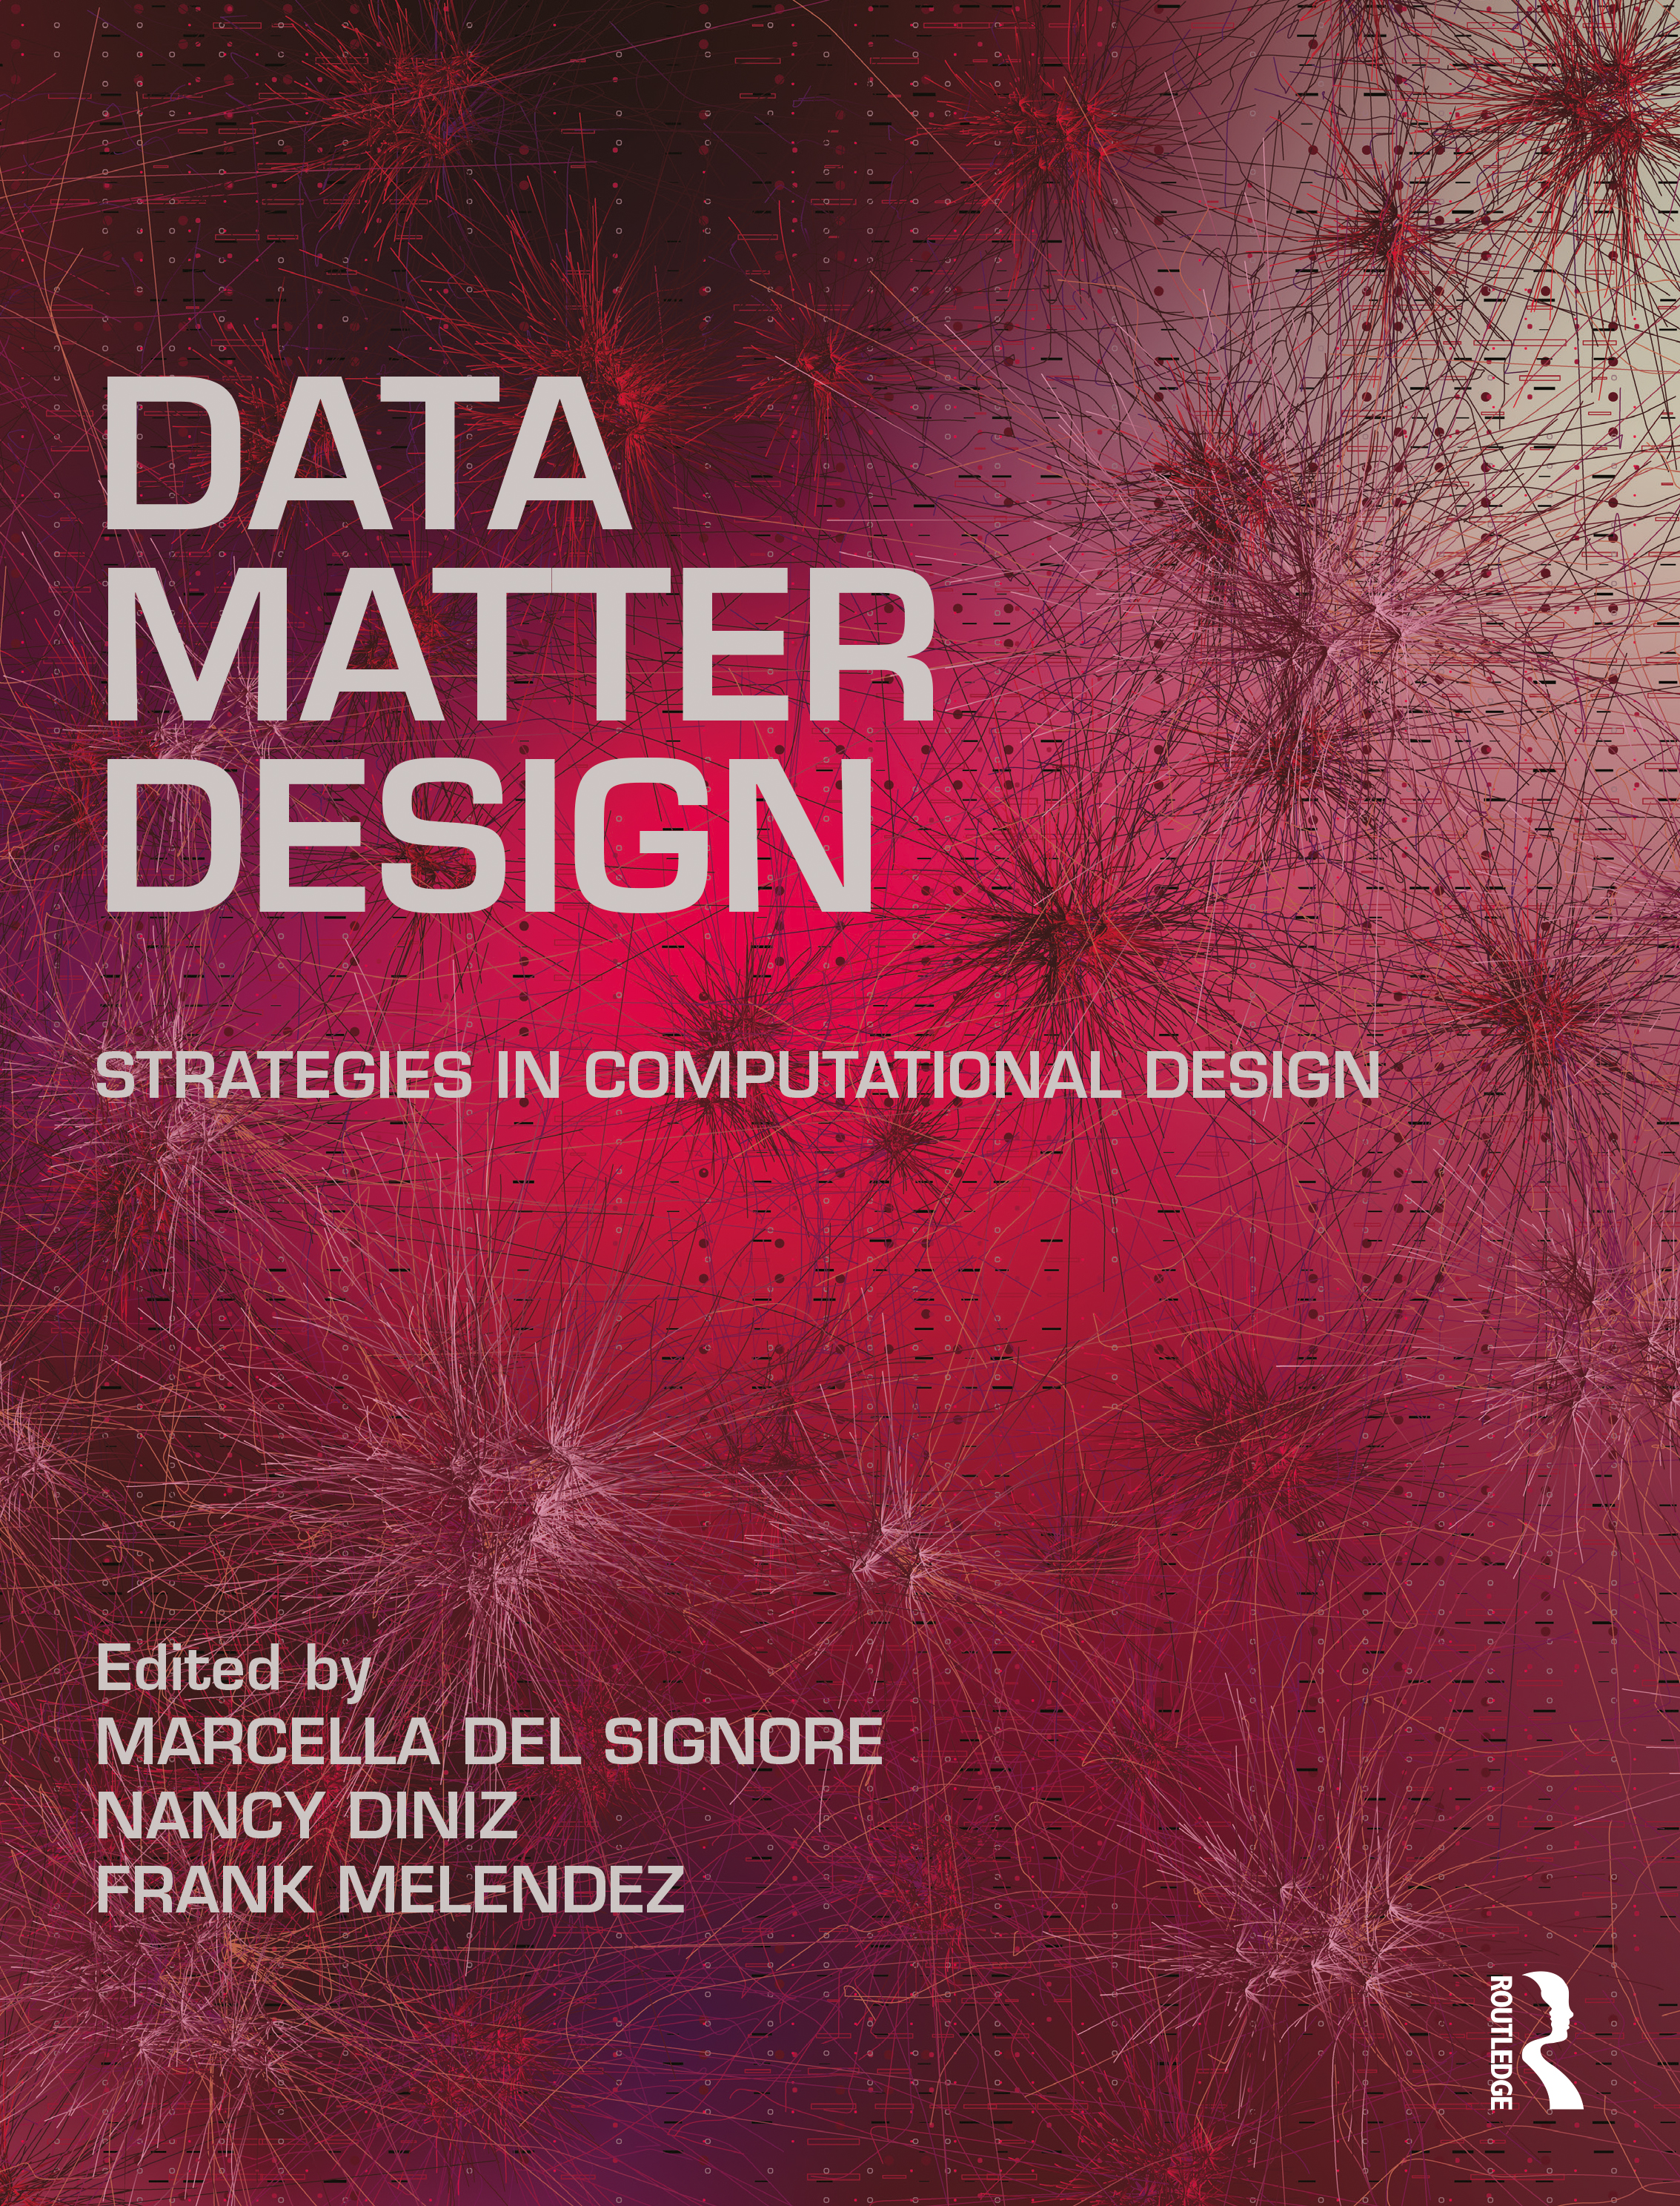 Data, Matter, Design